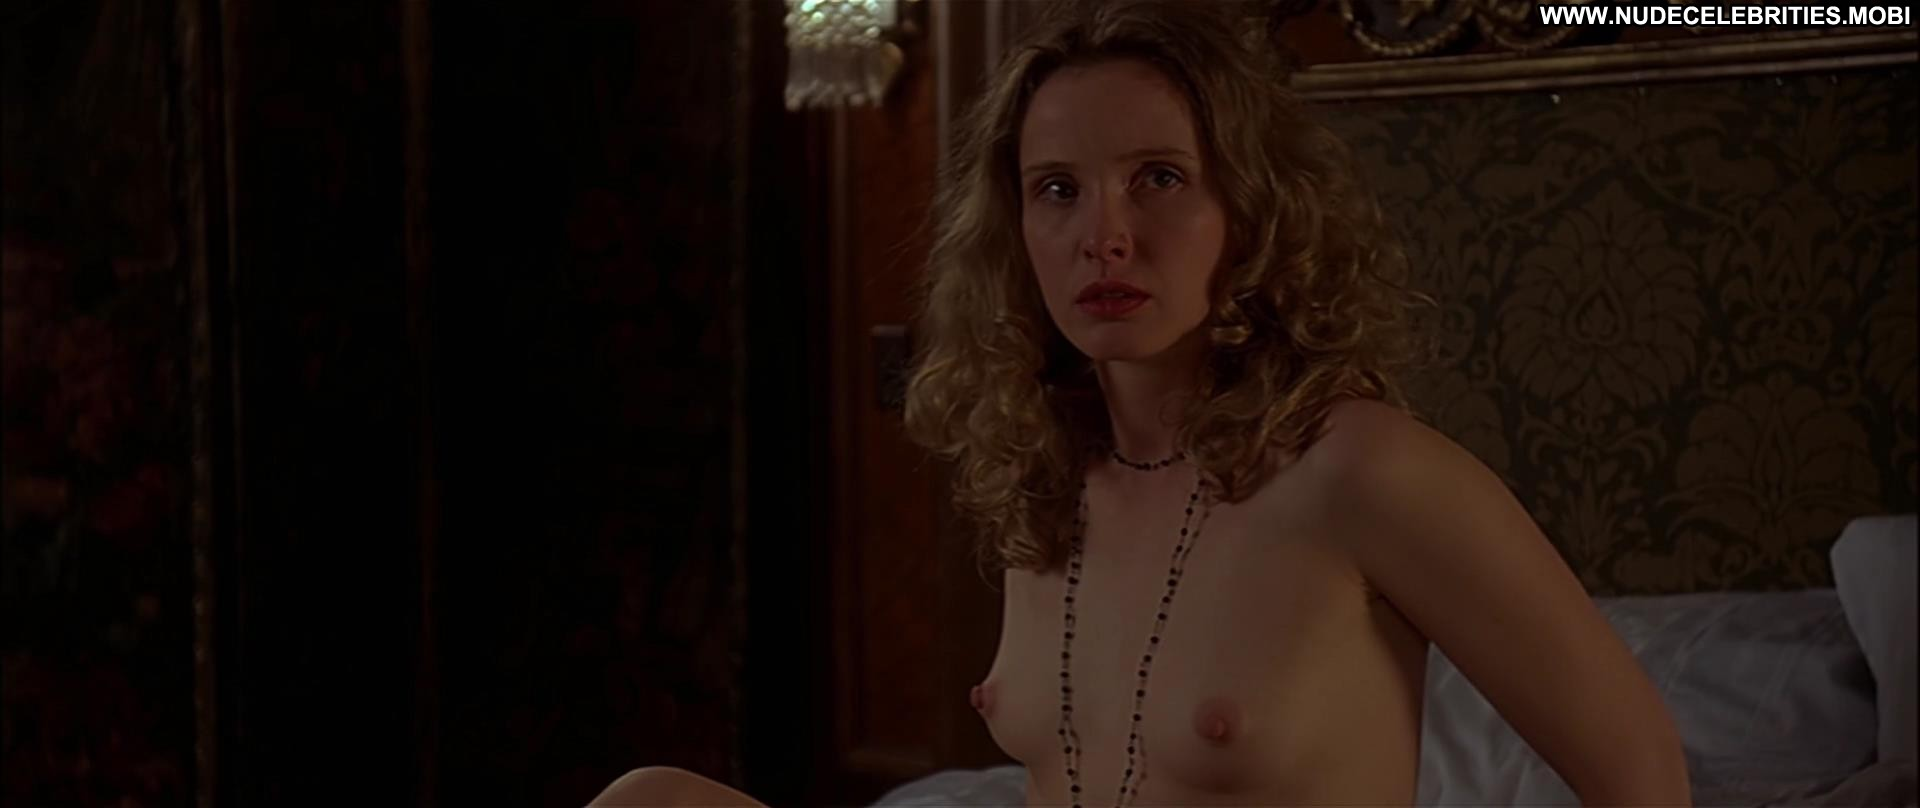 Sexy girl nude video